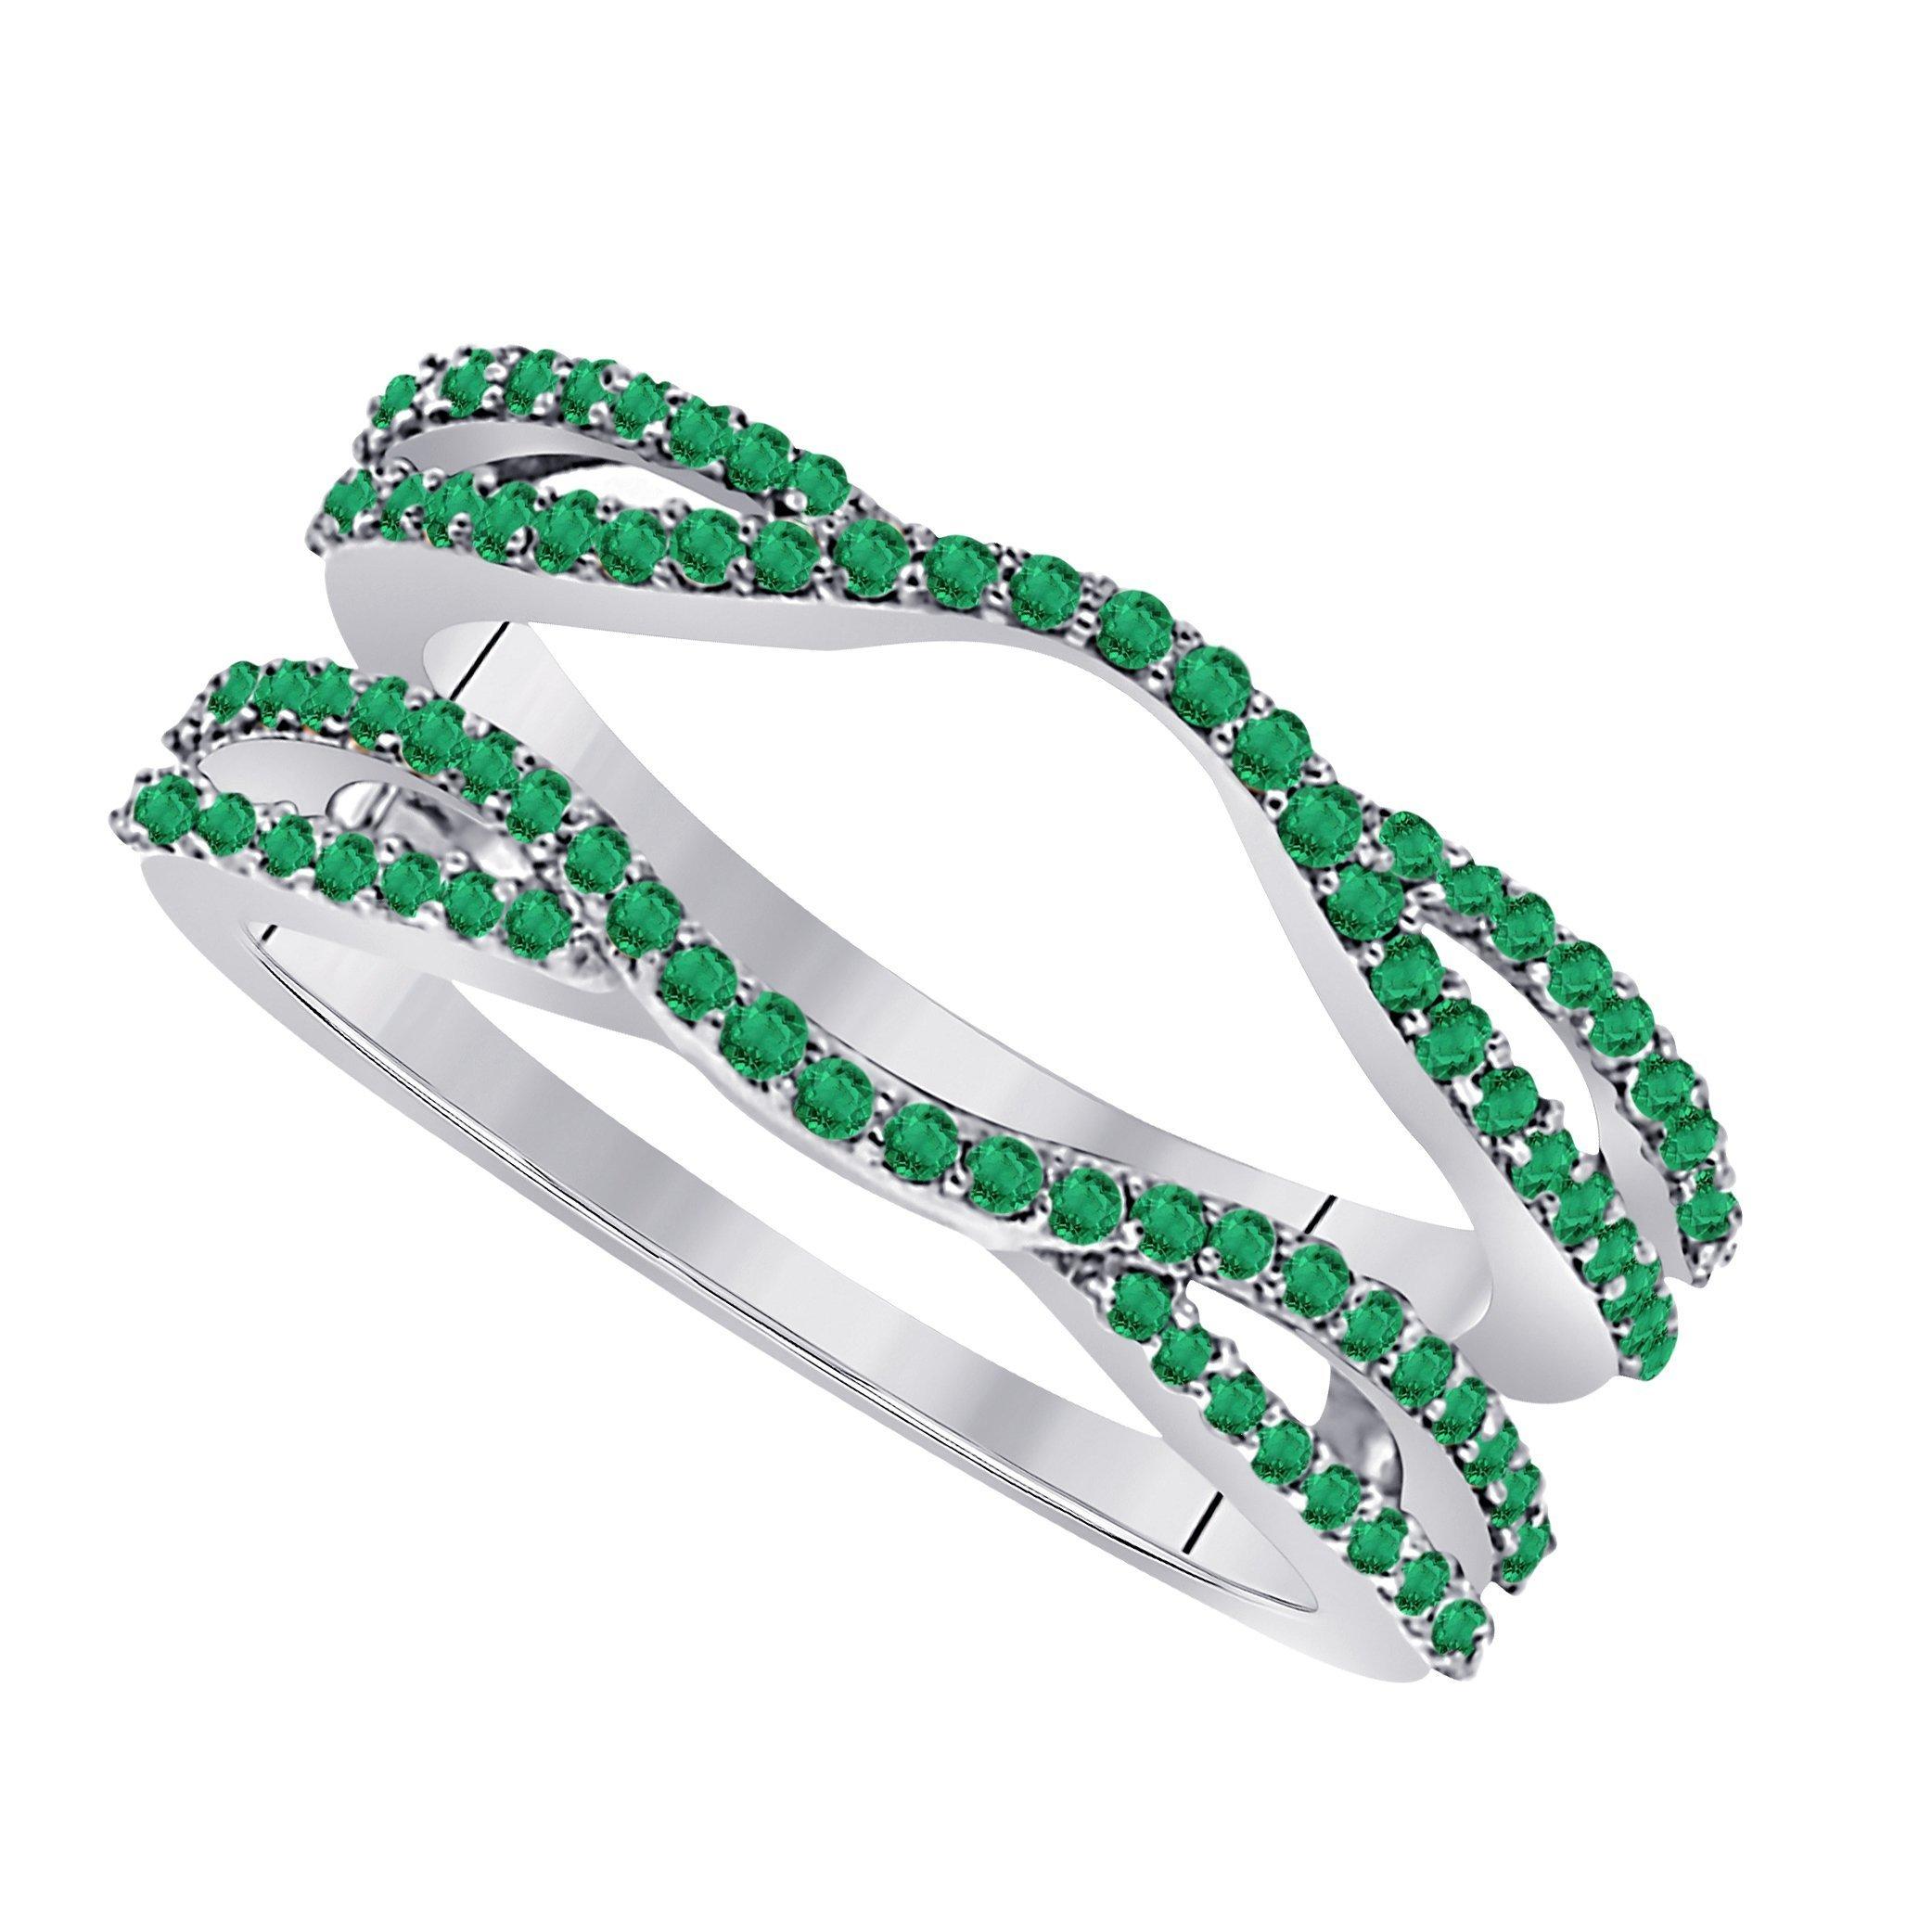 Star Retail 1/2 Ct 14K White Gold Finish Round Cut Lab Created Green Emerald Ladies Anniversary Wedding Band Enhancer Guard Double Chevron Ring